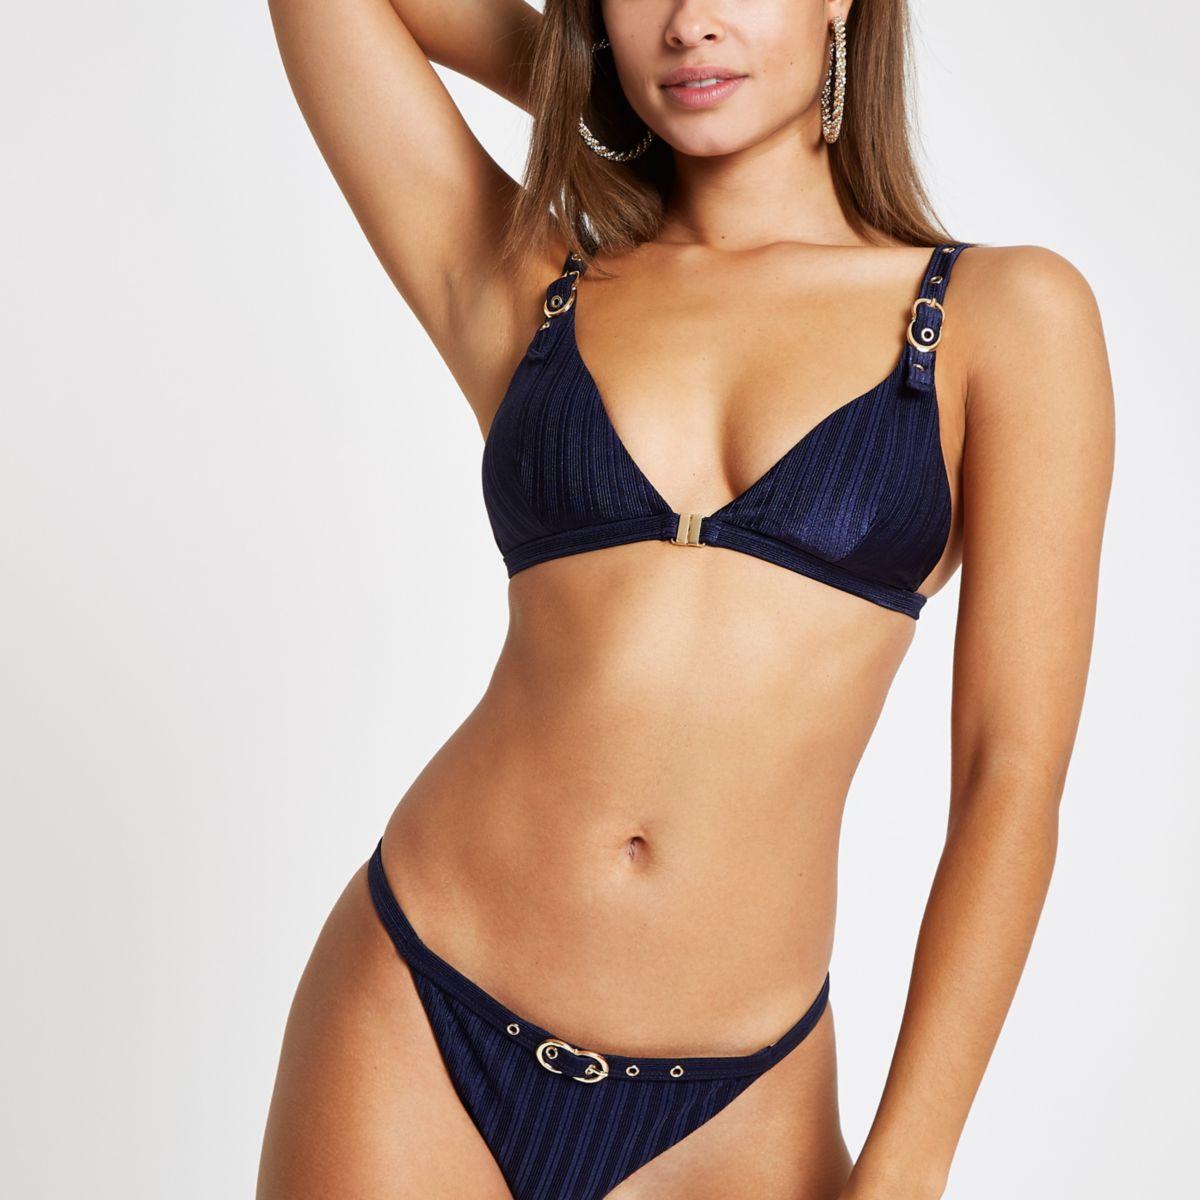 Marineblauwe triangel bikinitop met gesp-rand